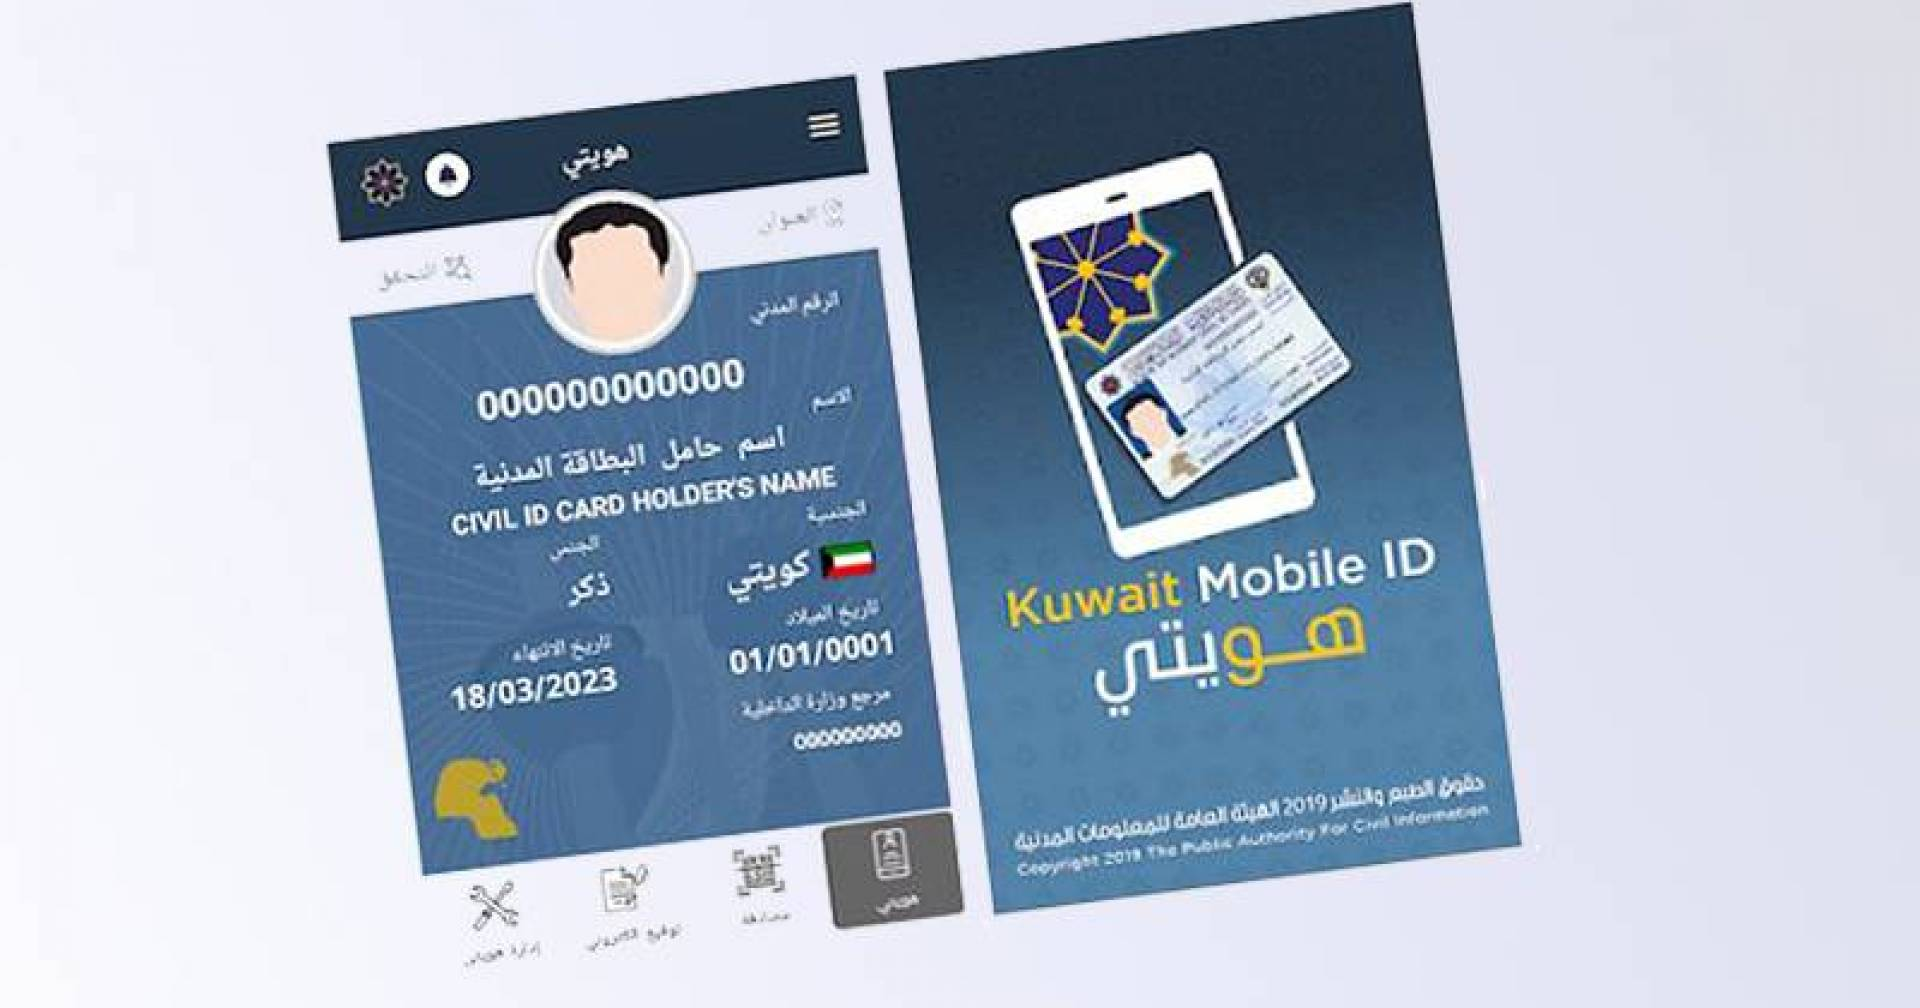 تطبيق هويتي تحميل مباشر للاندرويد 2021